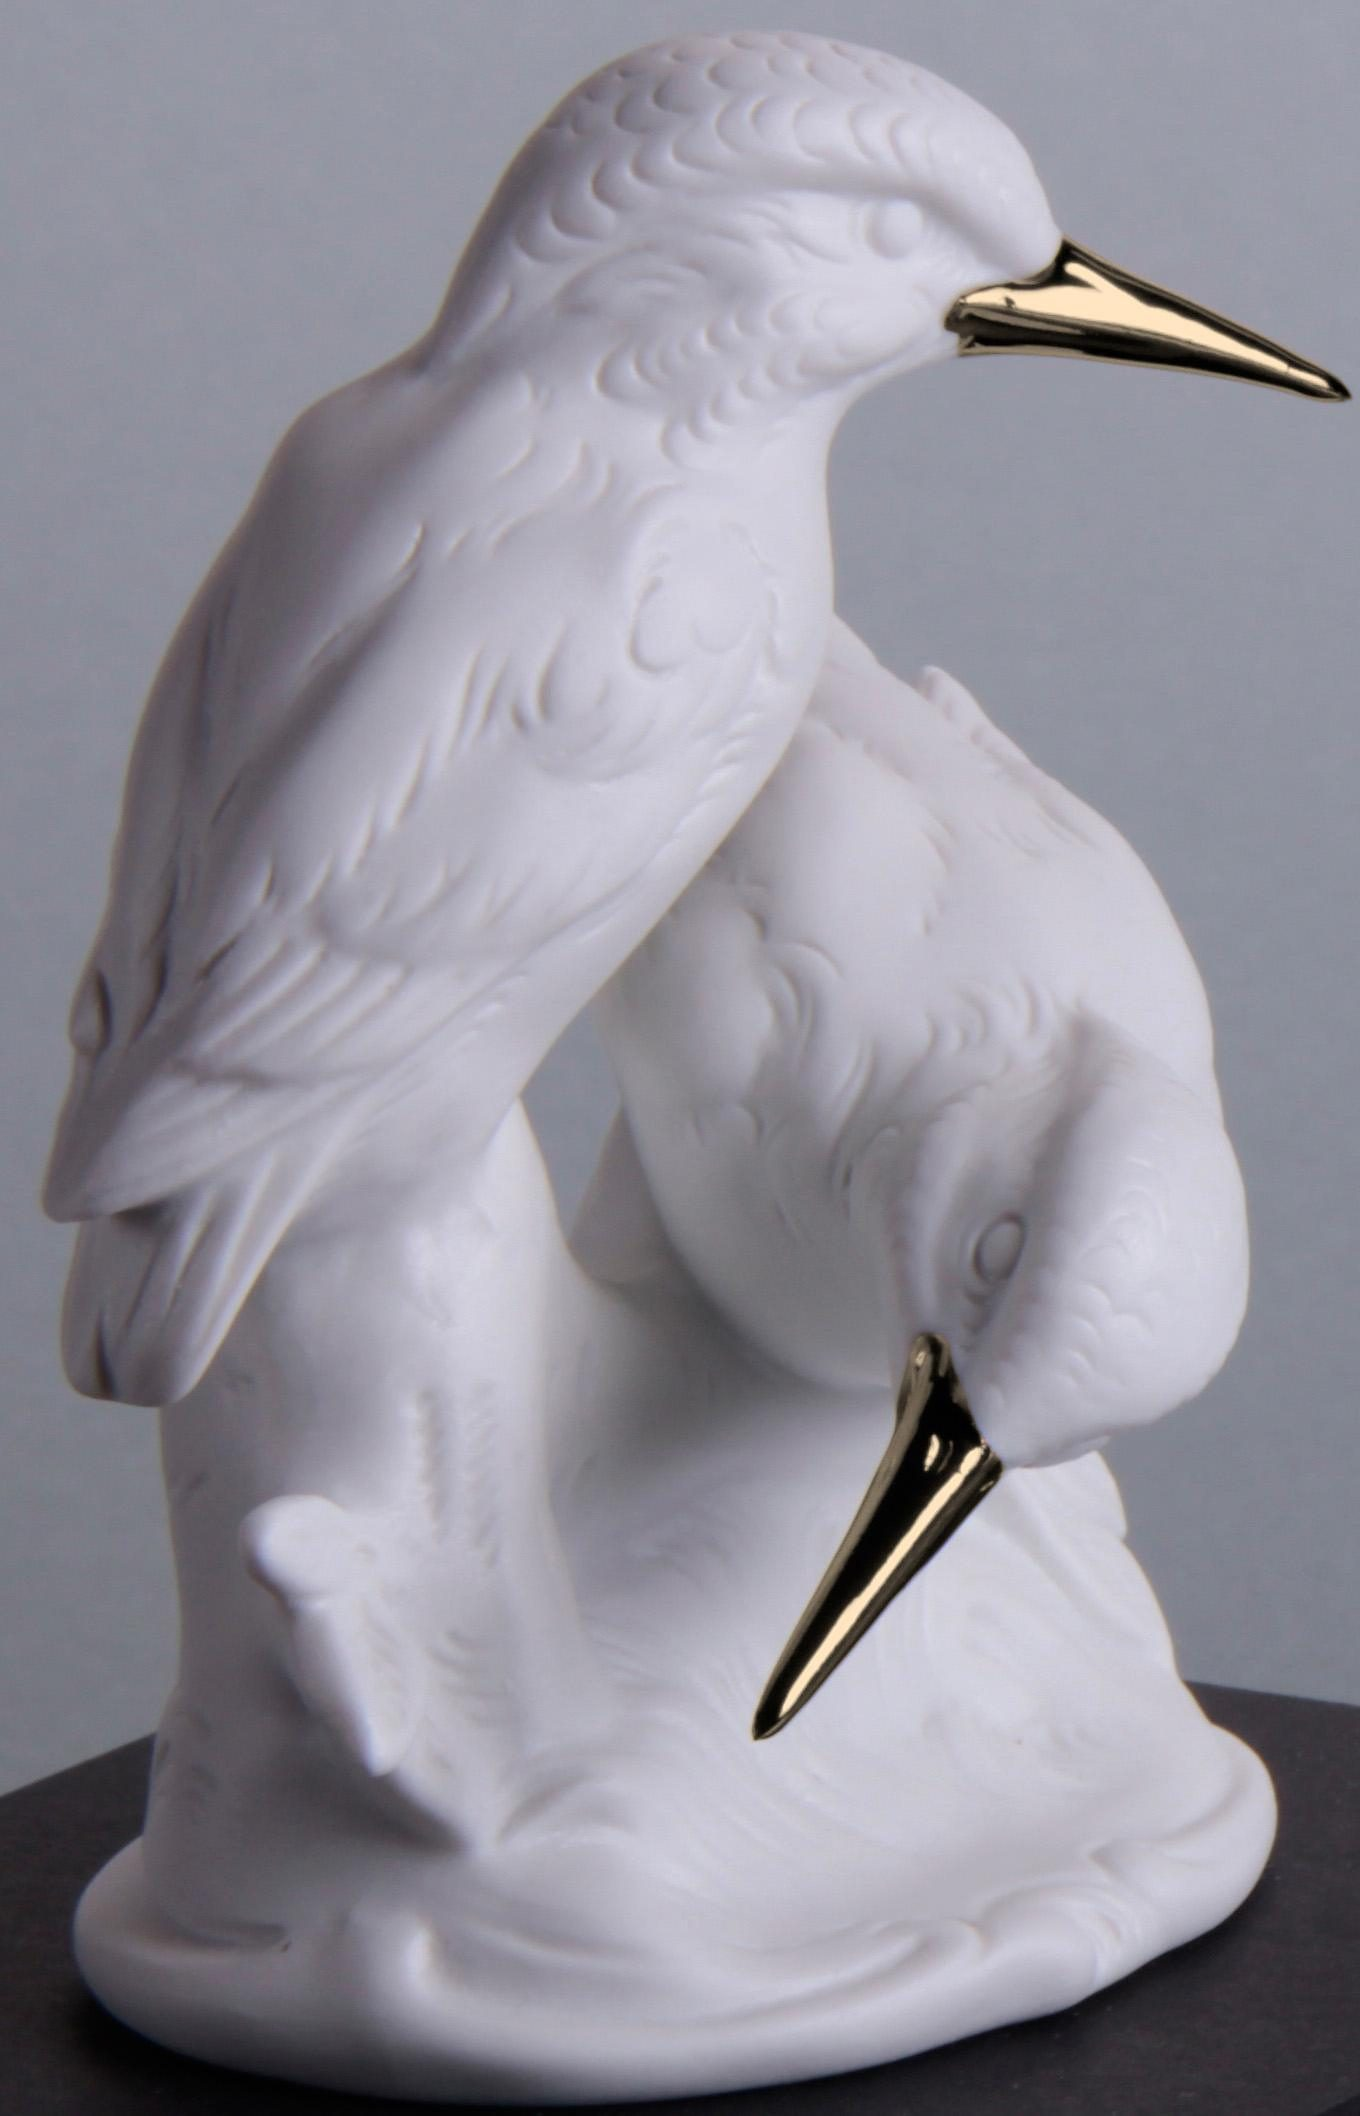 W&A Figur »Eisvogelgruppe« aus Porzellan